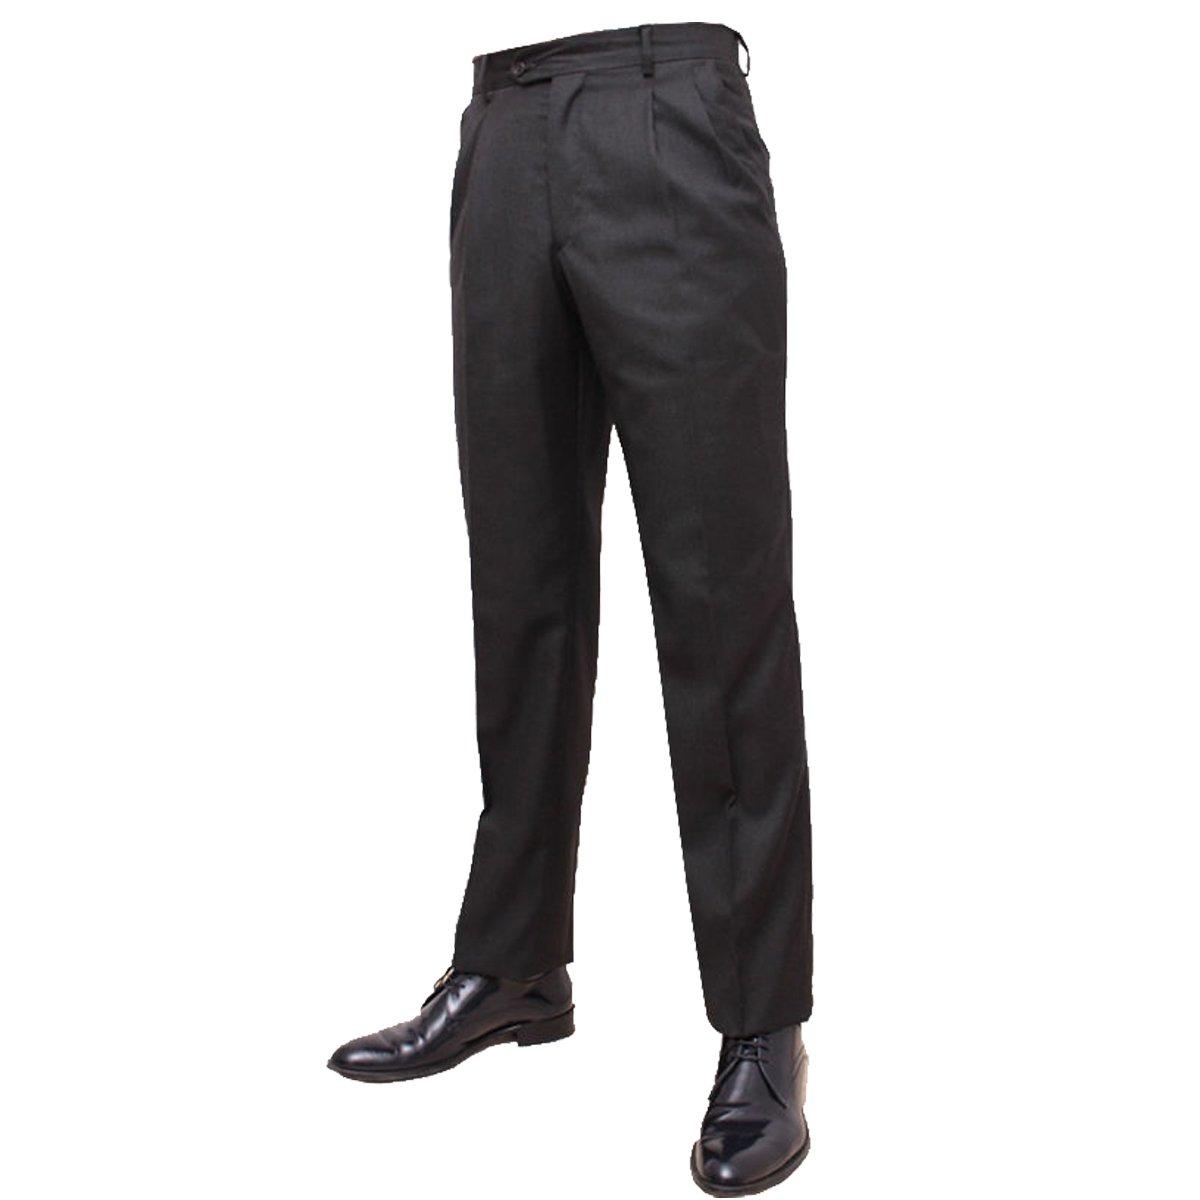 Pantalone uomo tasca america classico vita alta due penc